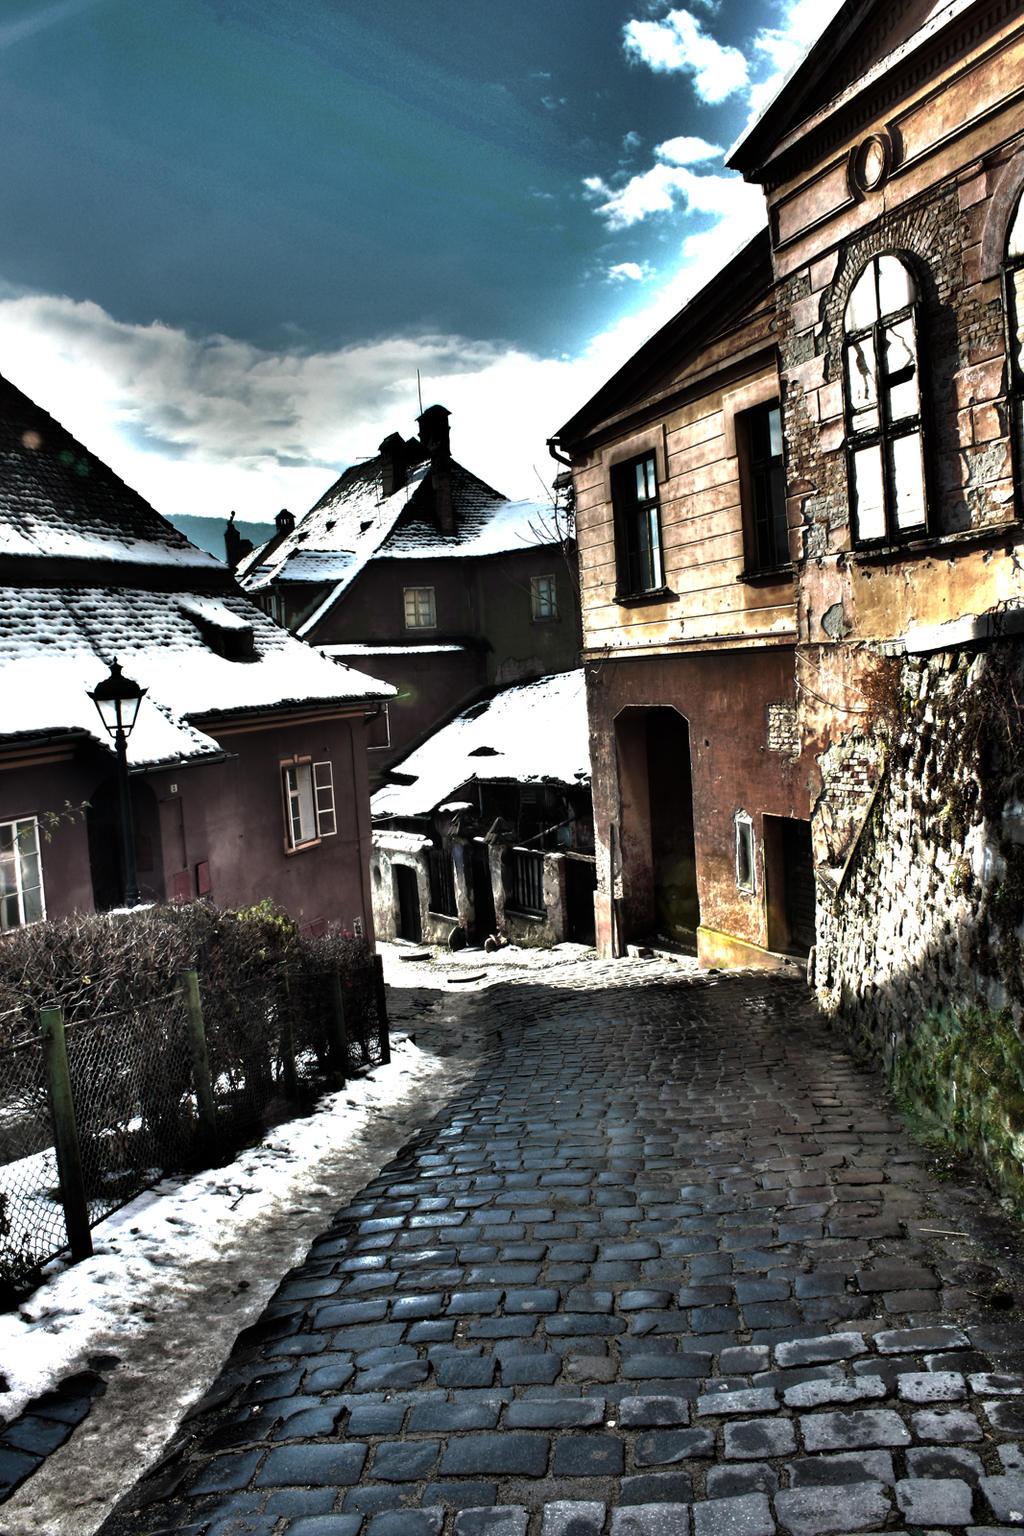 Sighi Street, Grunge by mariustipa